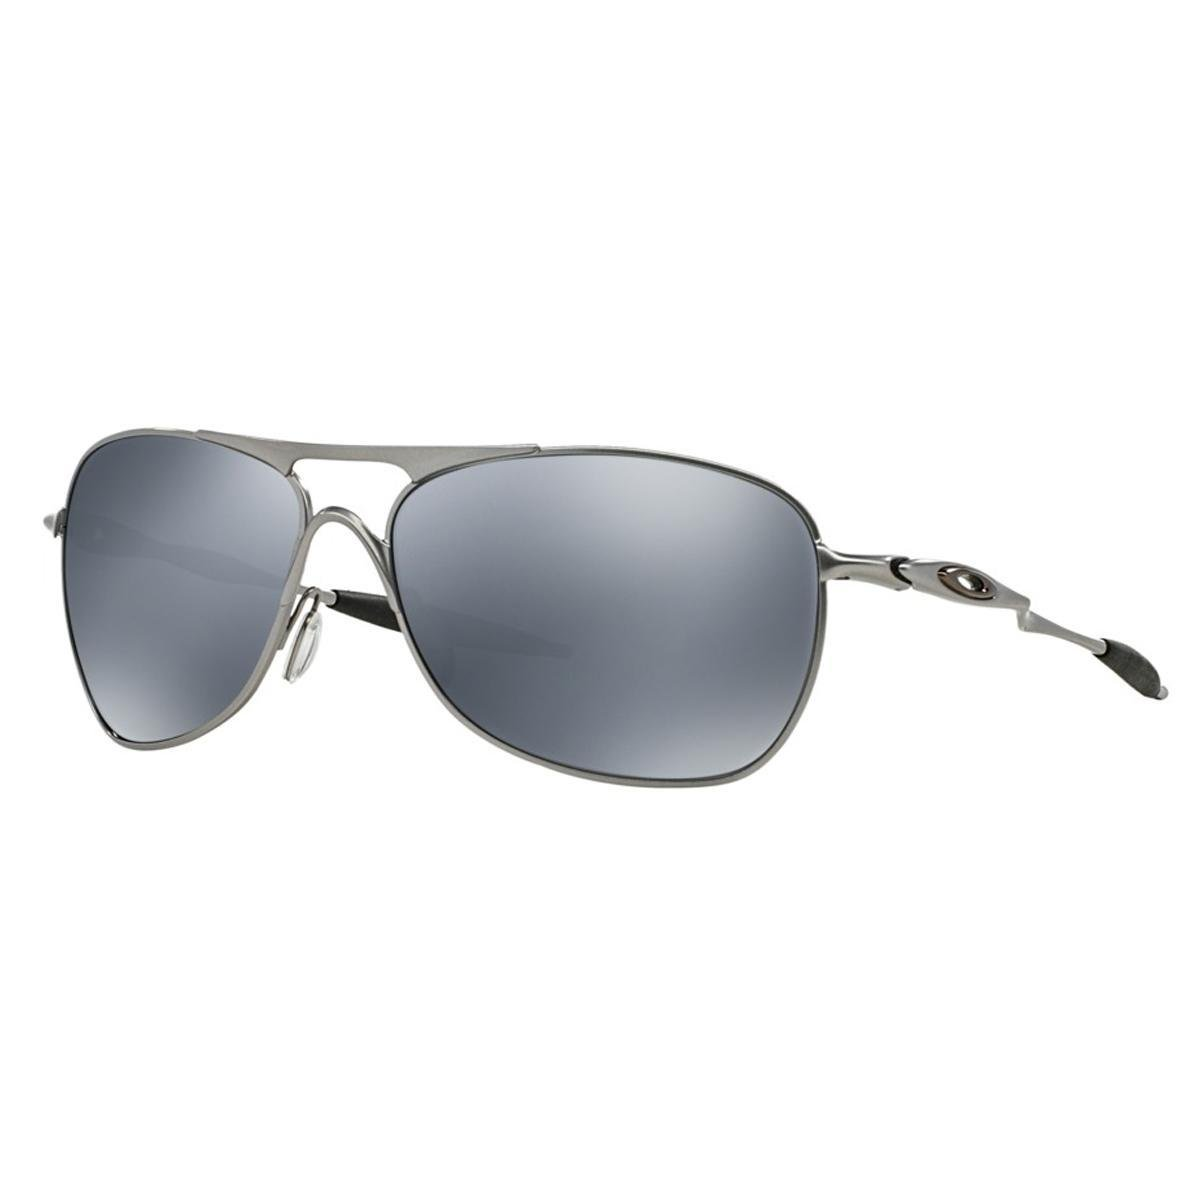 f06188d48e844 Óculos Oakley Crosshair - Compre Agora